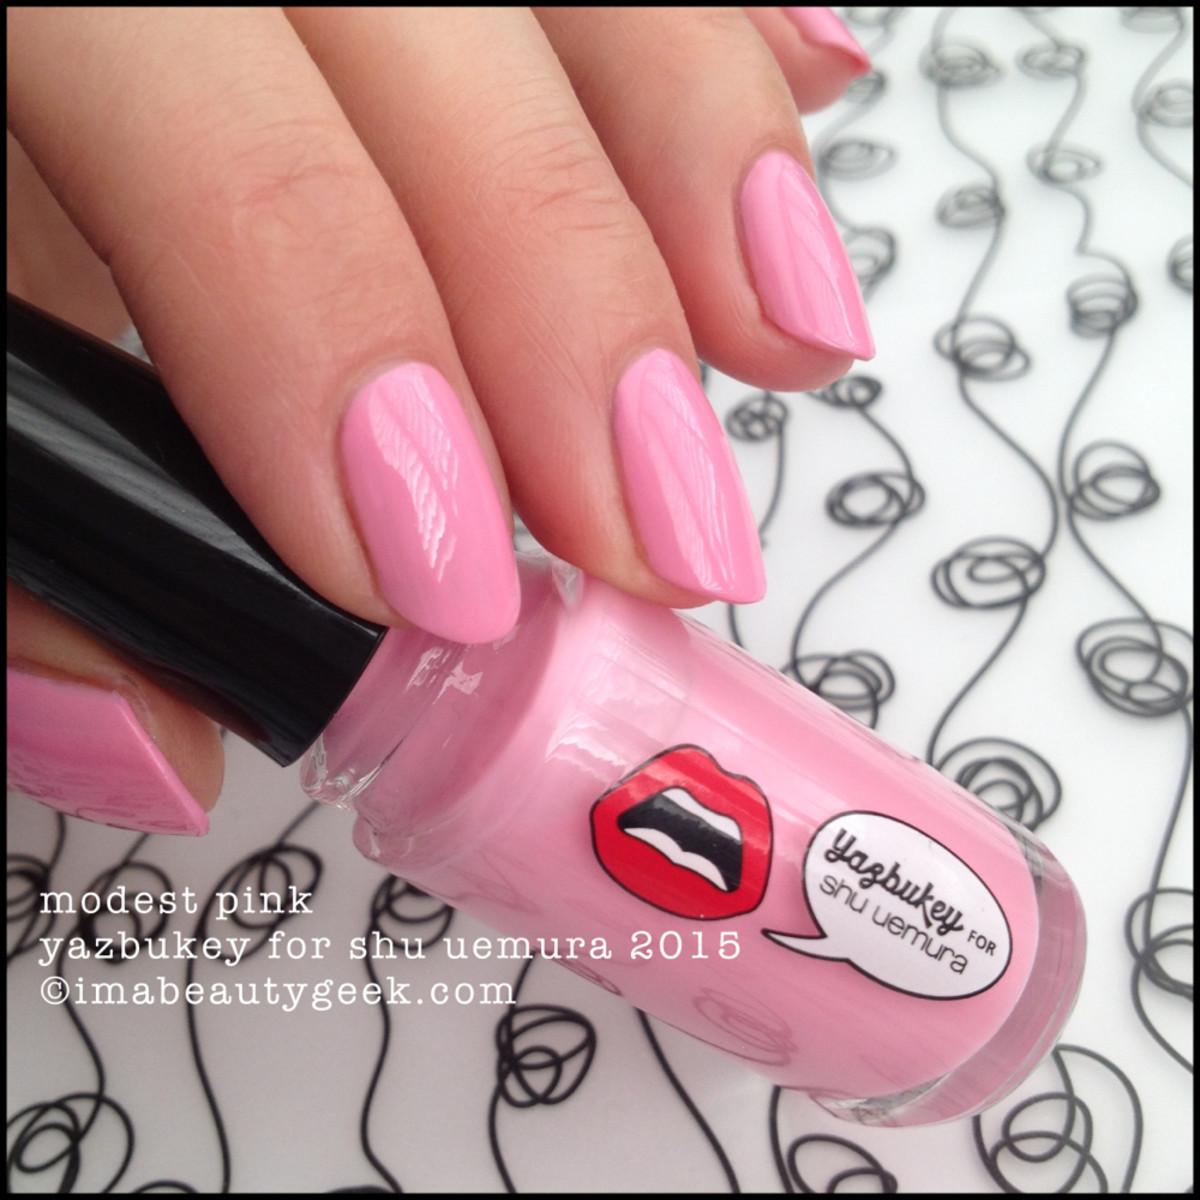 Yazbukey Nail for Shu Uemura Modest Pink 2015